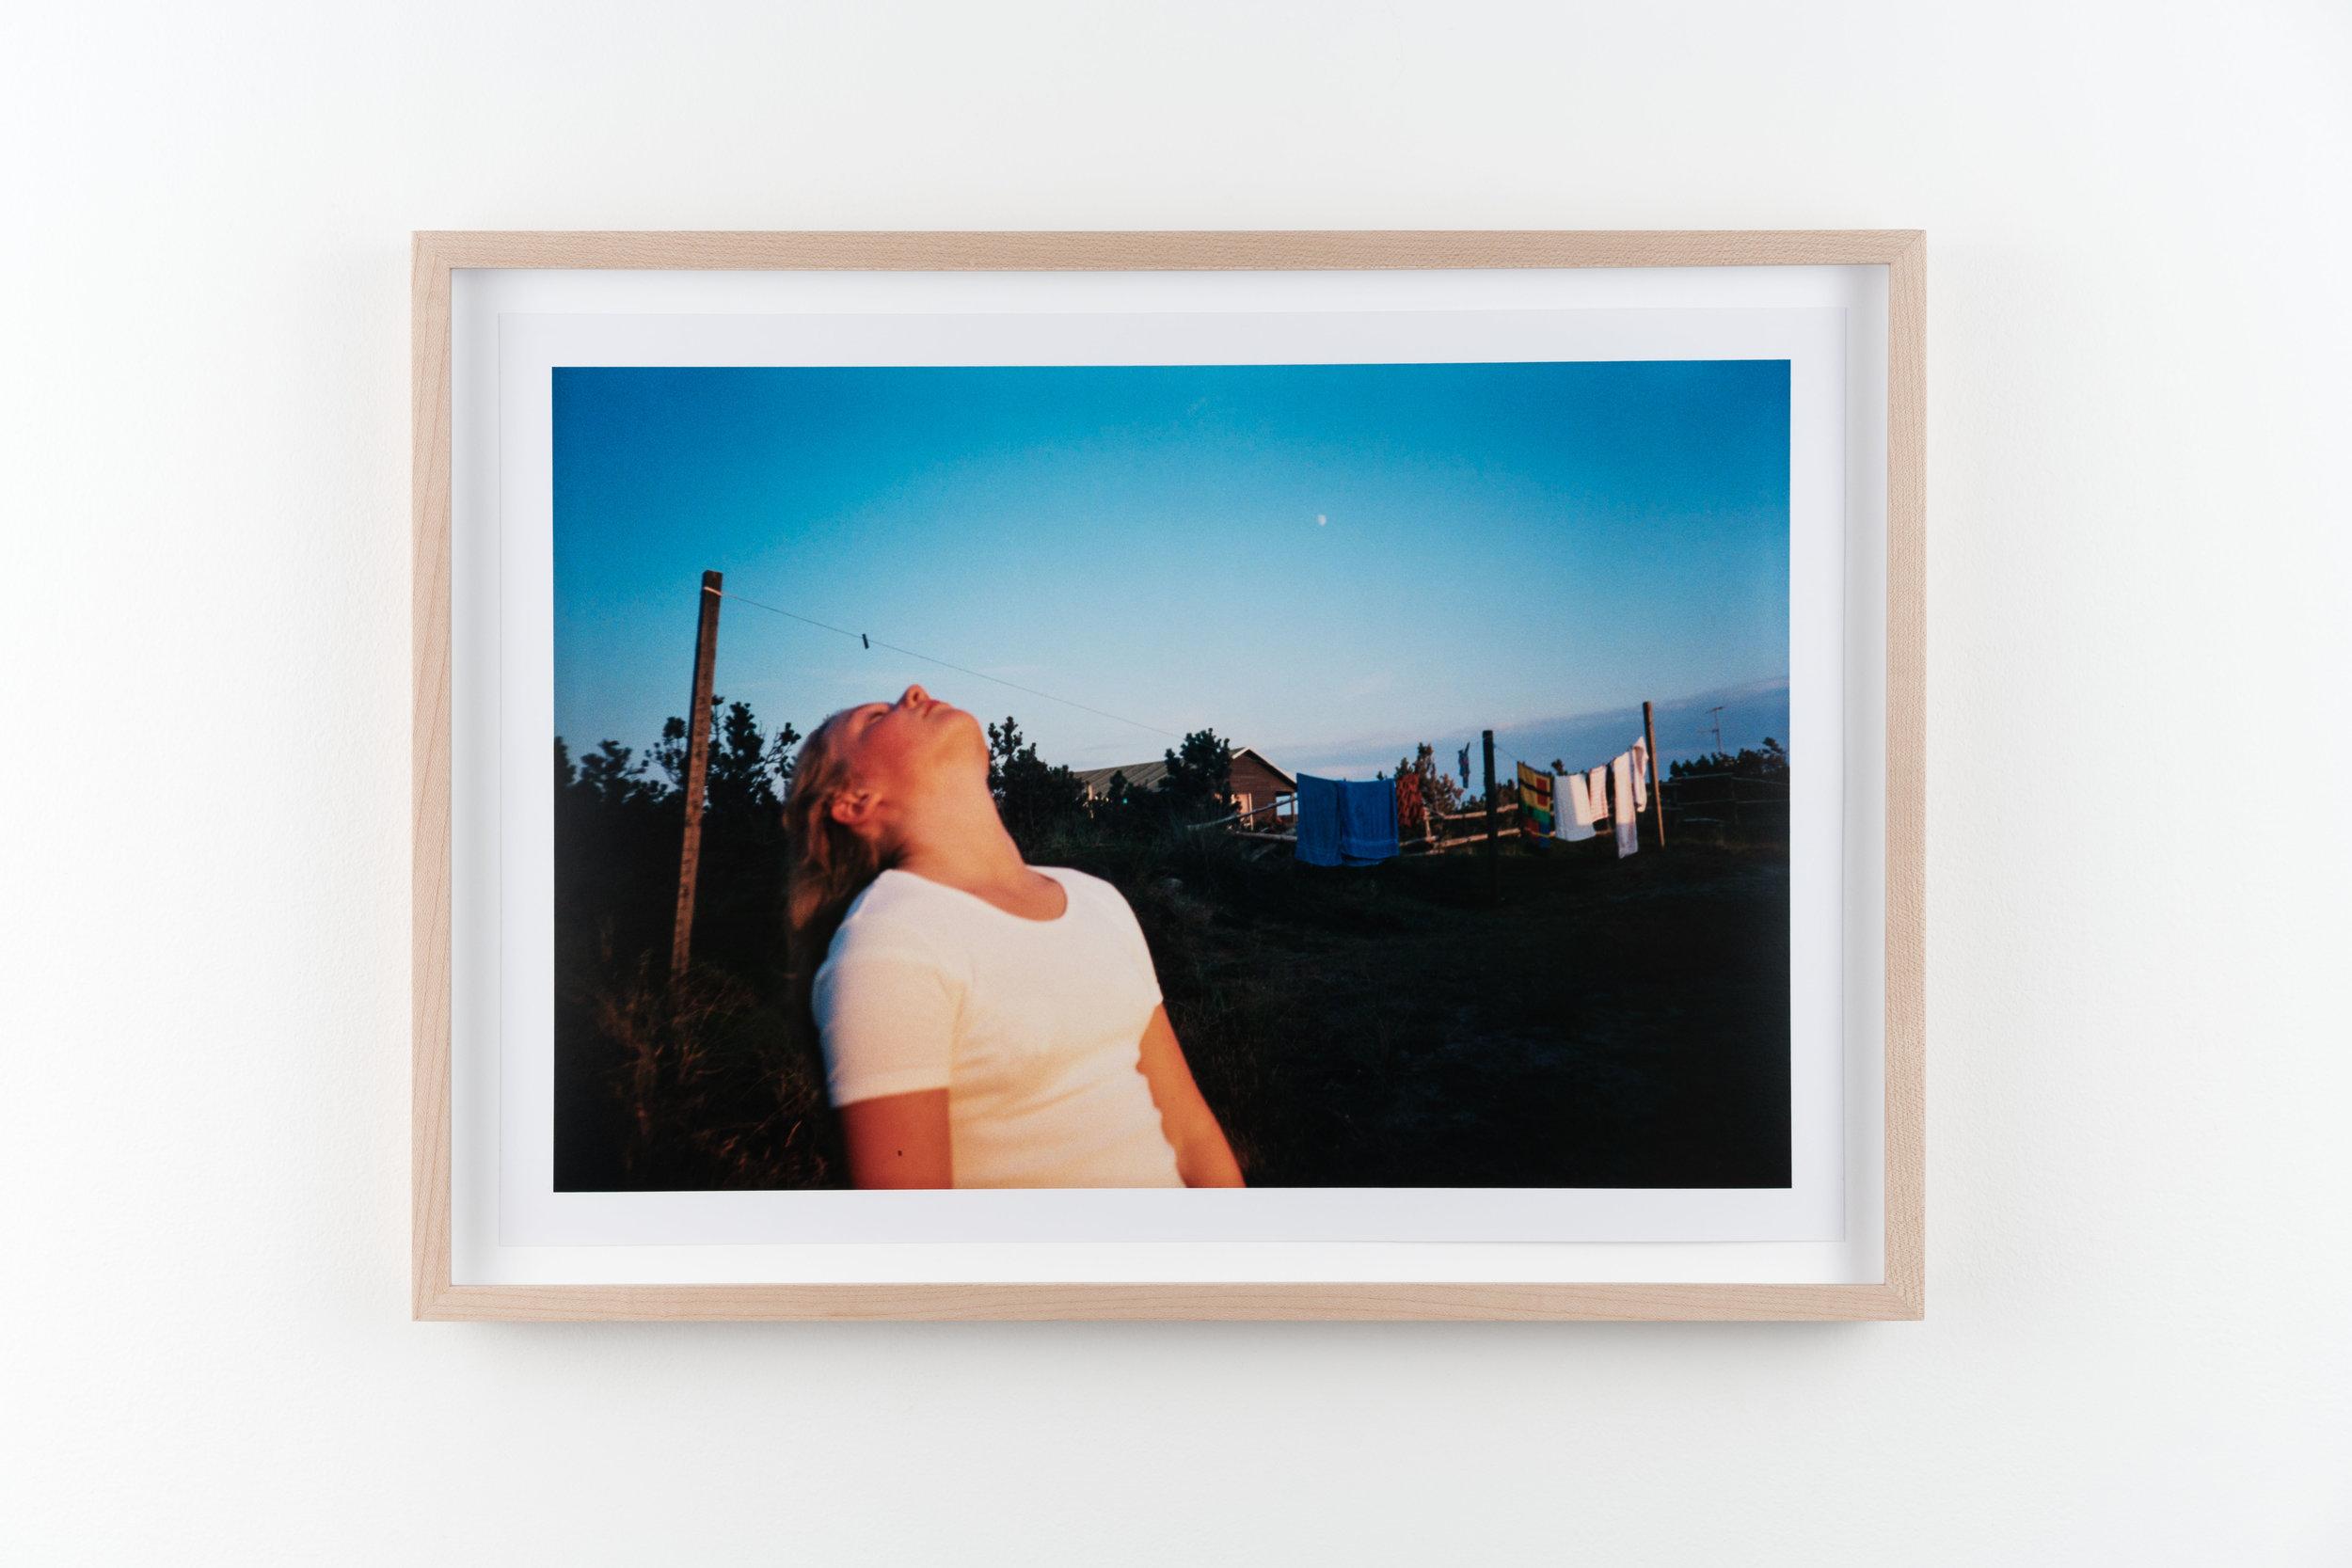 Julie 2 , 1997/2018 Hand-printed c-print 21.8 x 32.8 cm (28.5 x 39.5 cm framed)